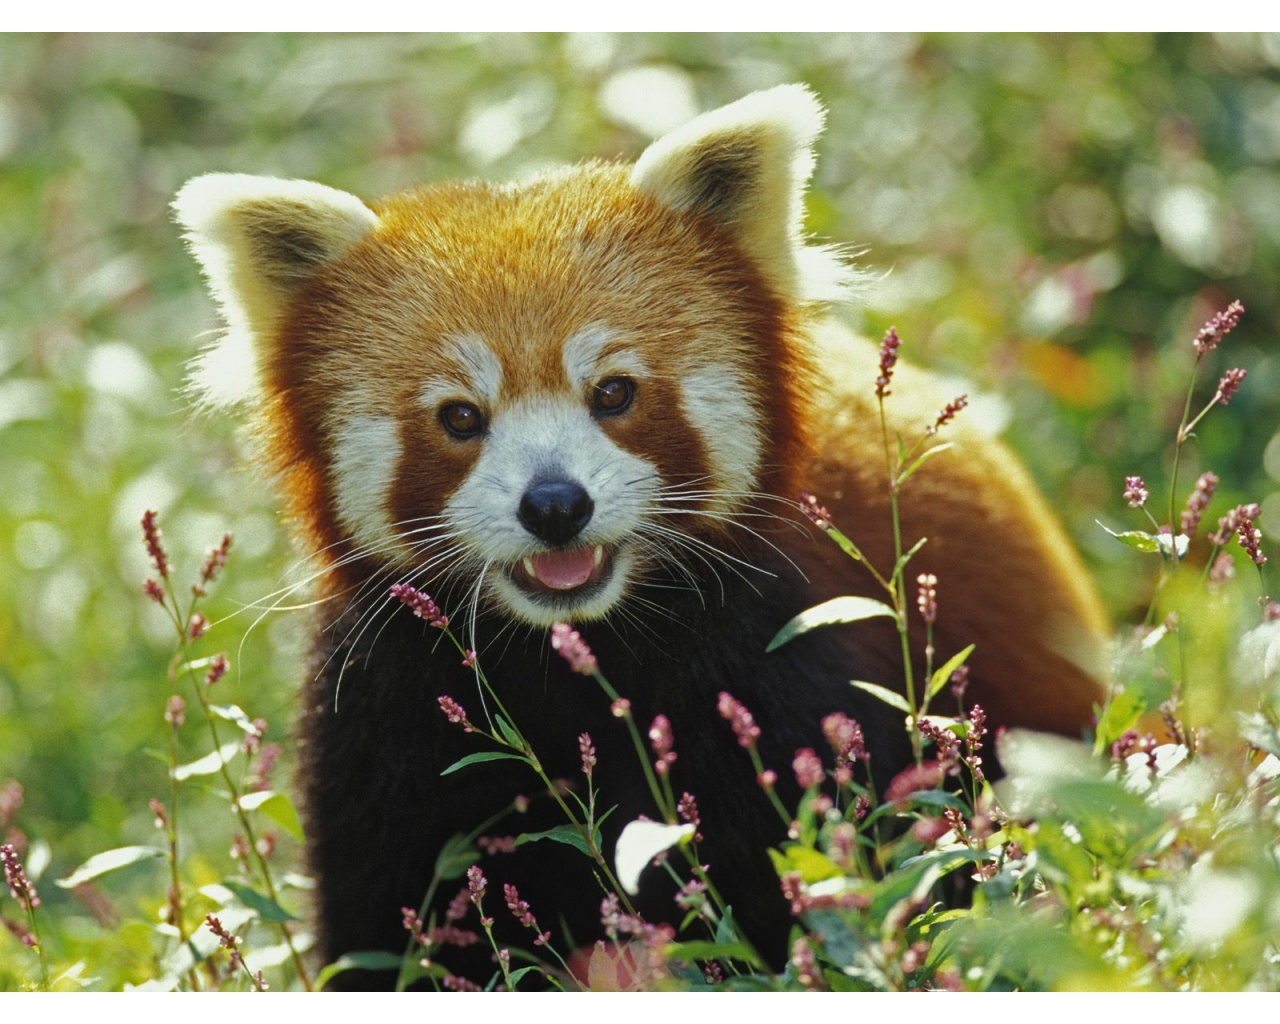 Cute Red Panda Wallpapers   1280x1024   429749 1280x1024